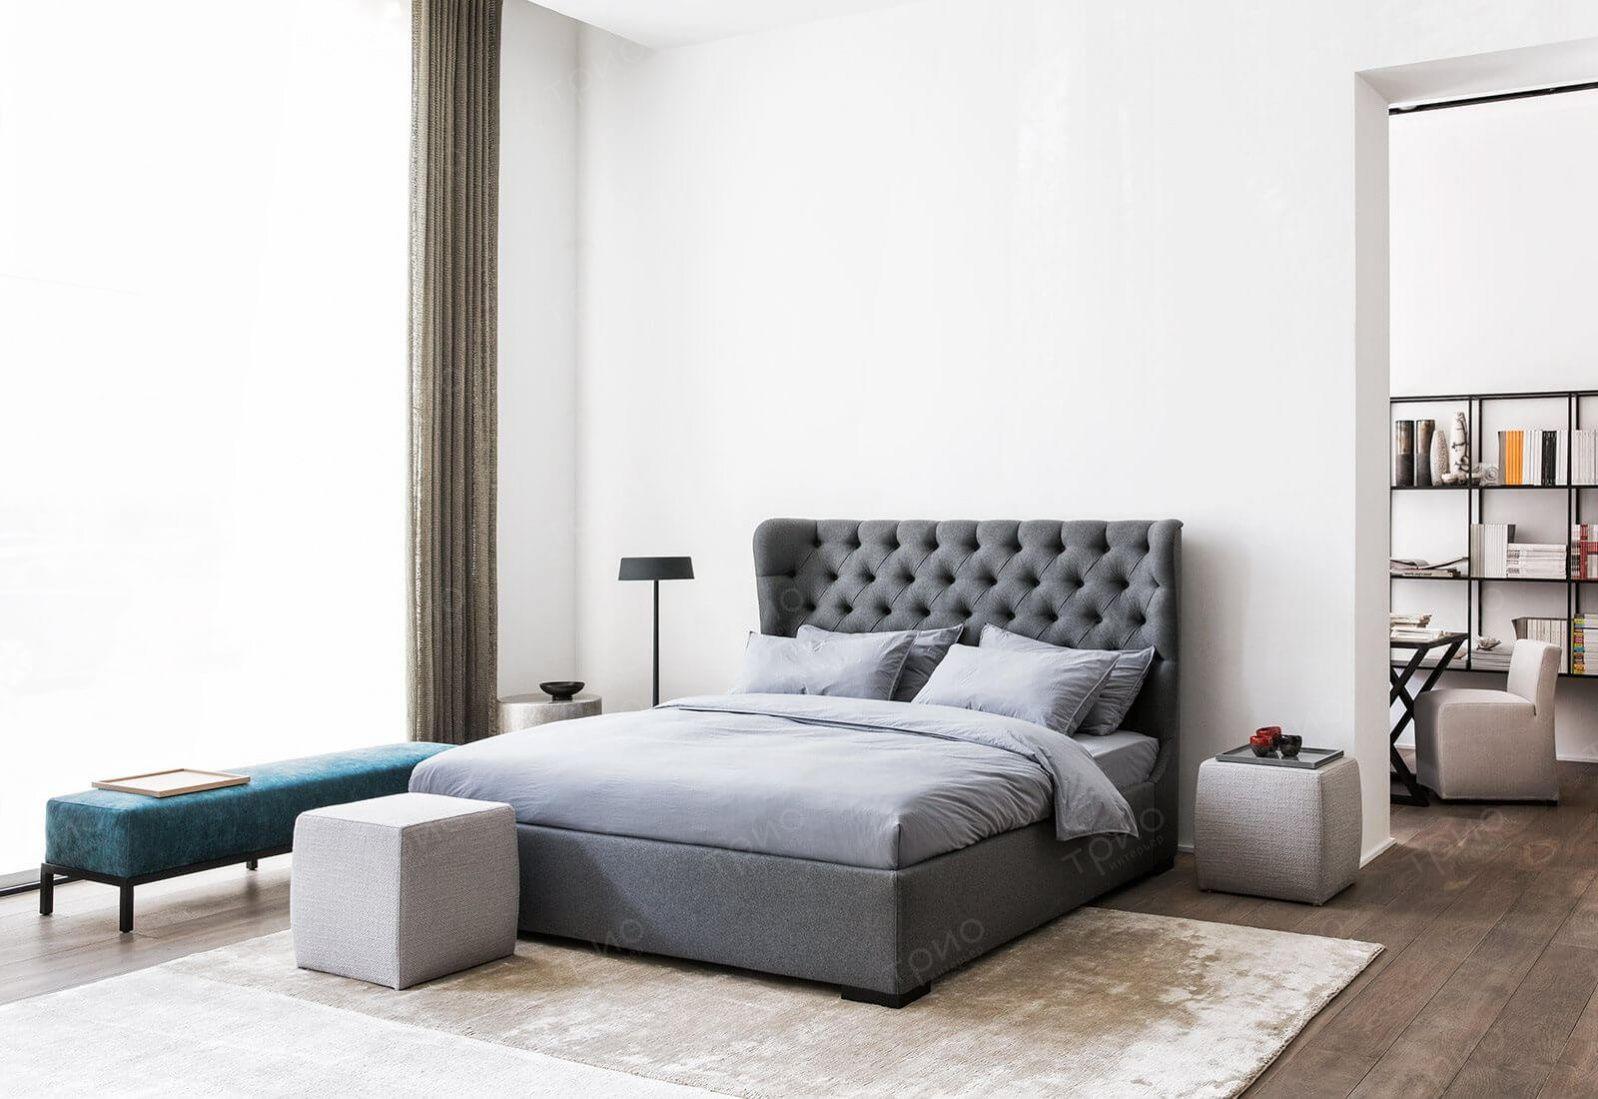 Meridiani arredamento ~ Meridiani i norton sofa i jo small armchairs i miller low table i